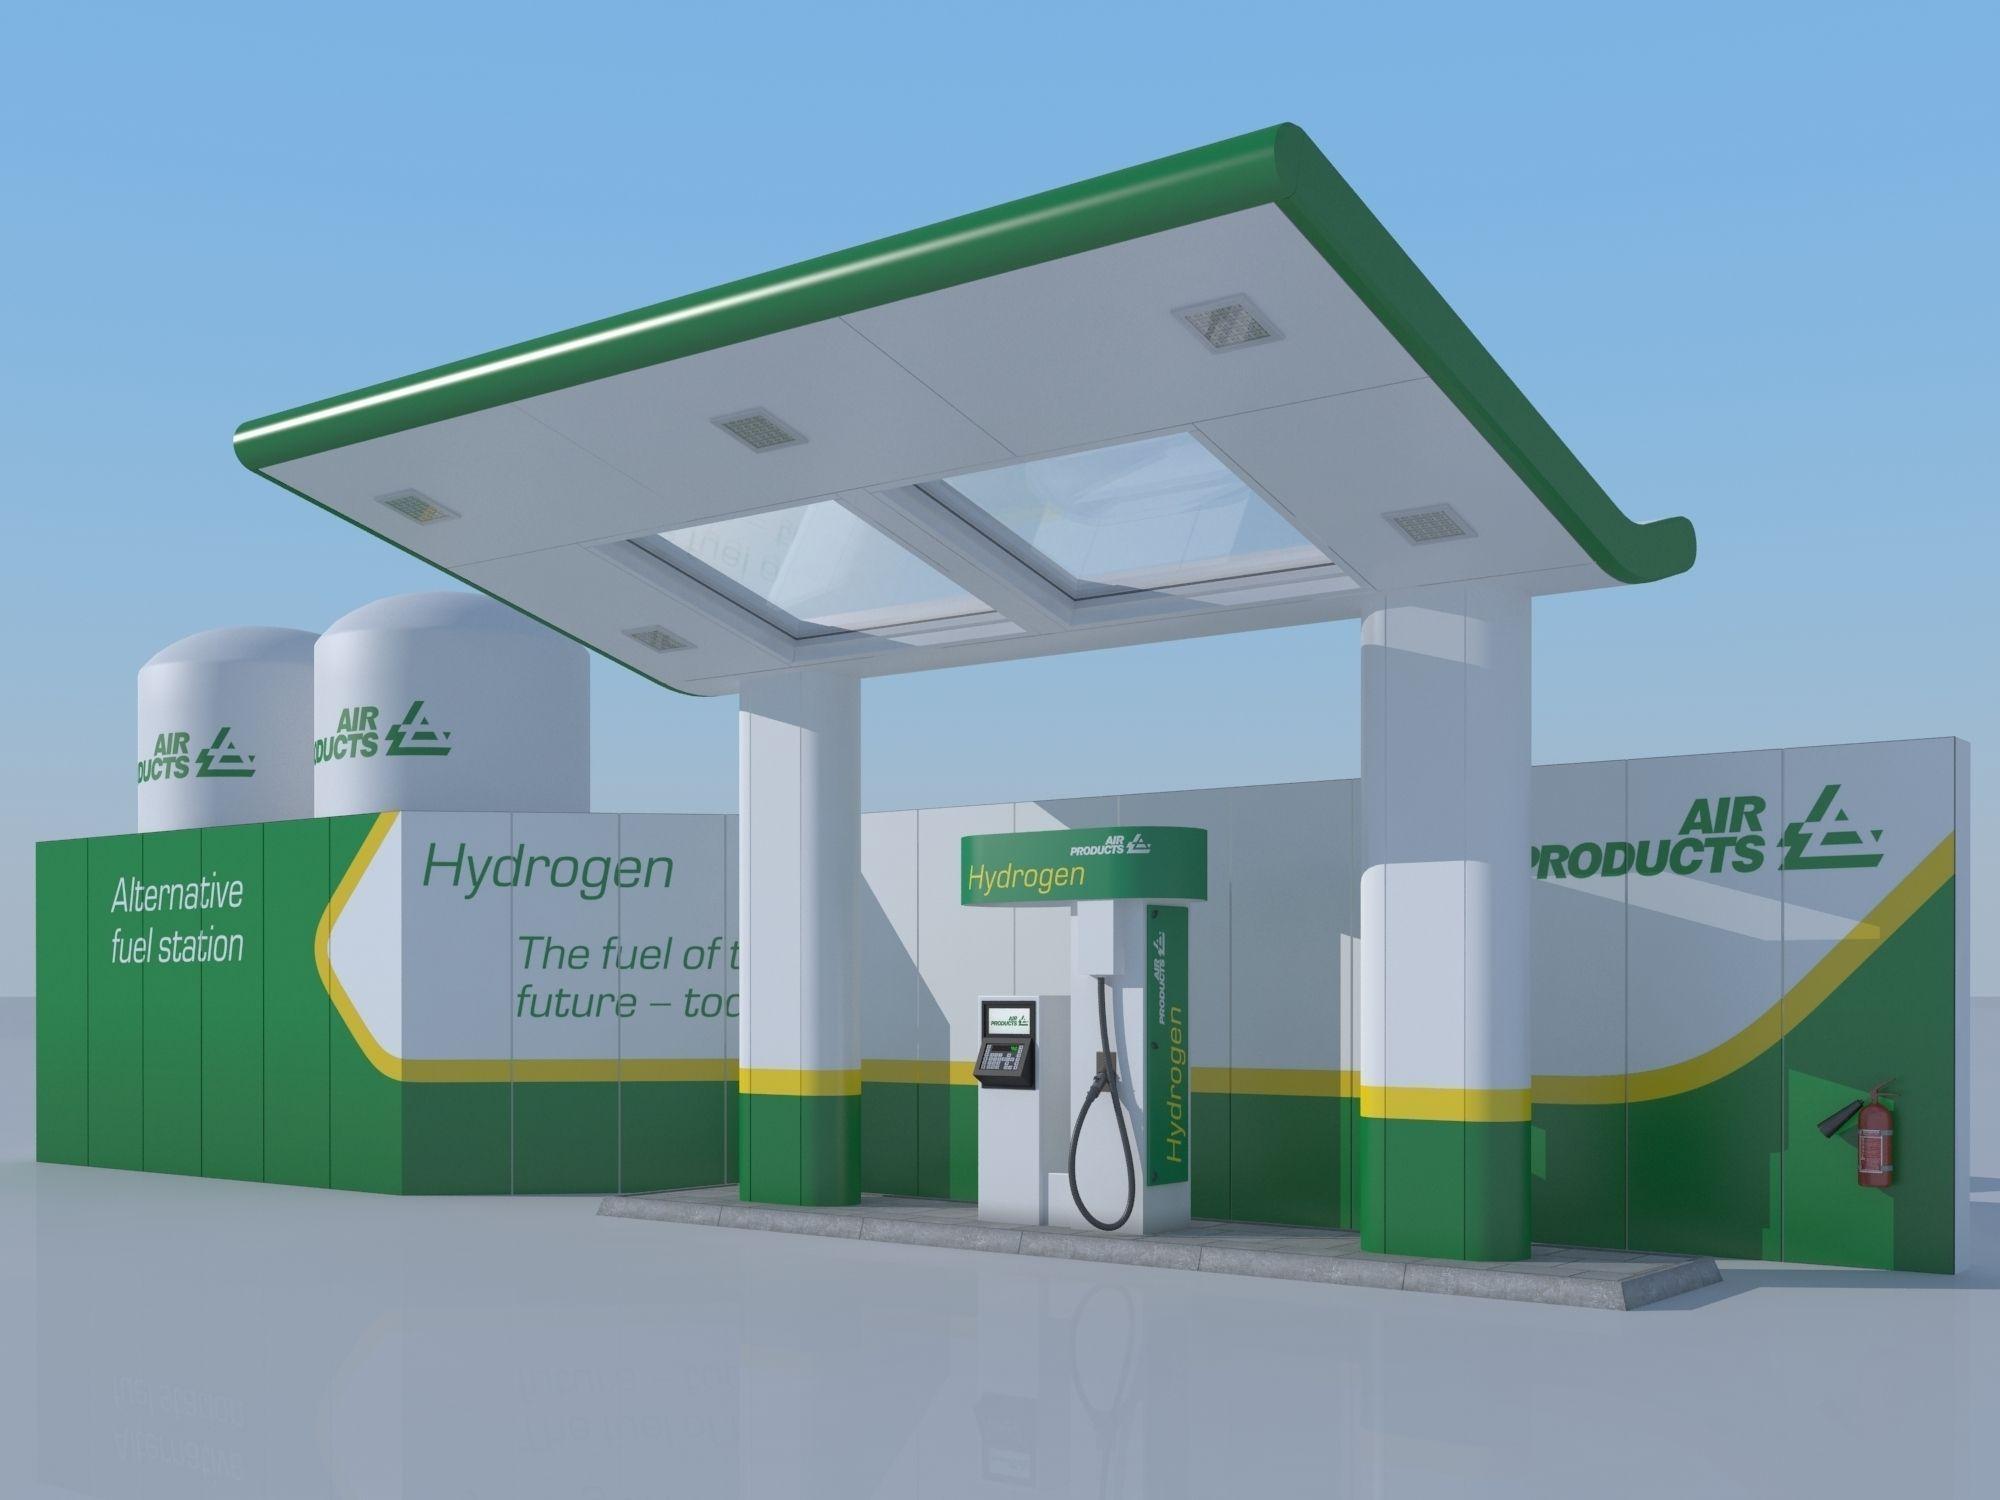 Hydrogen gas station